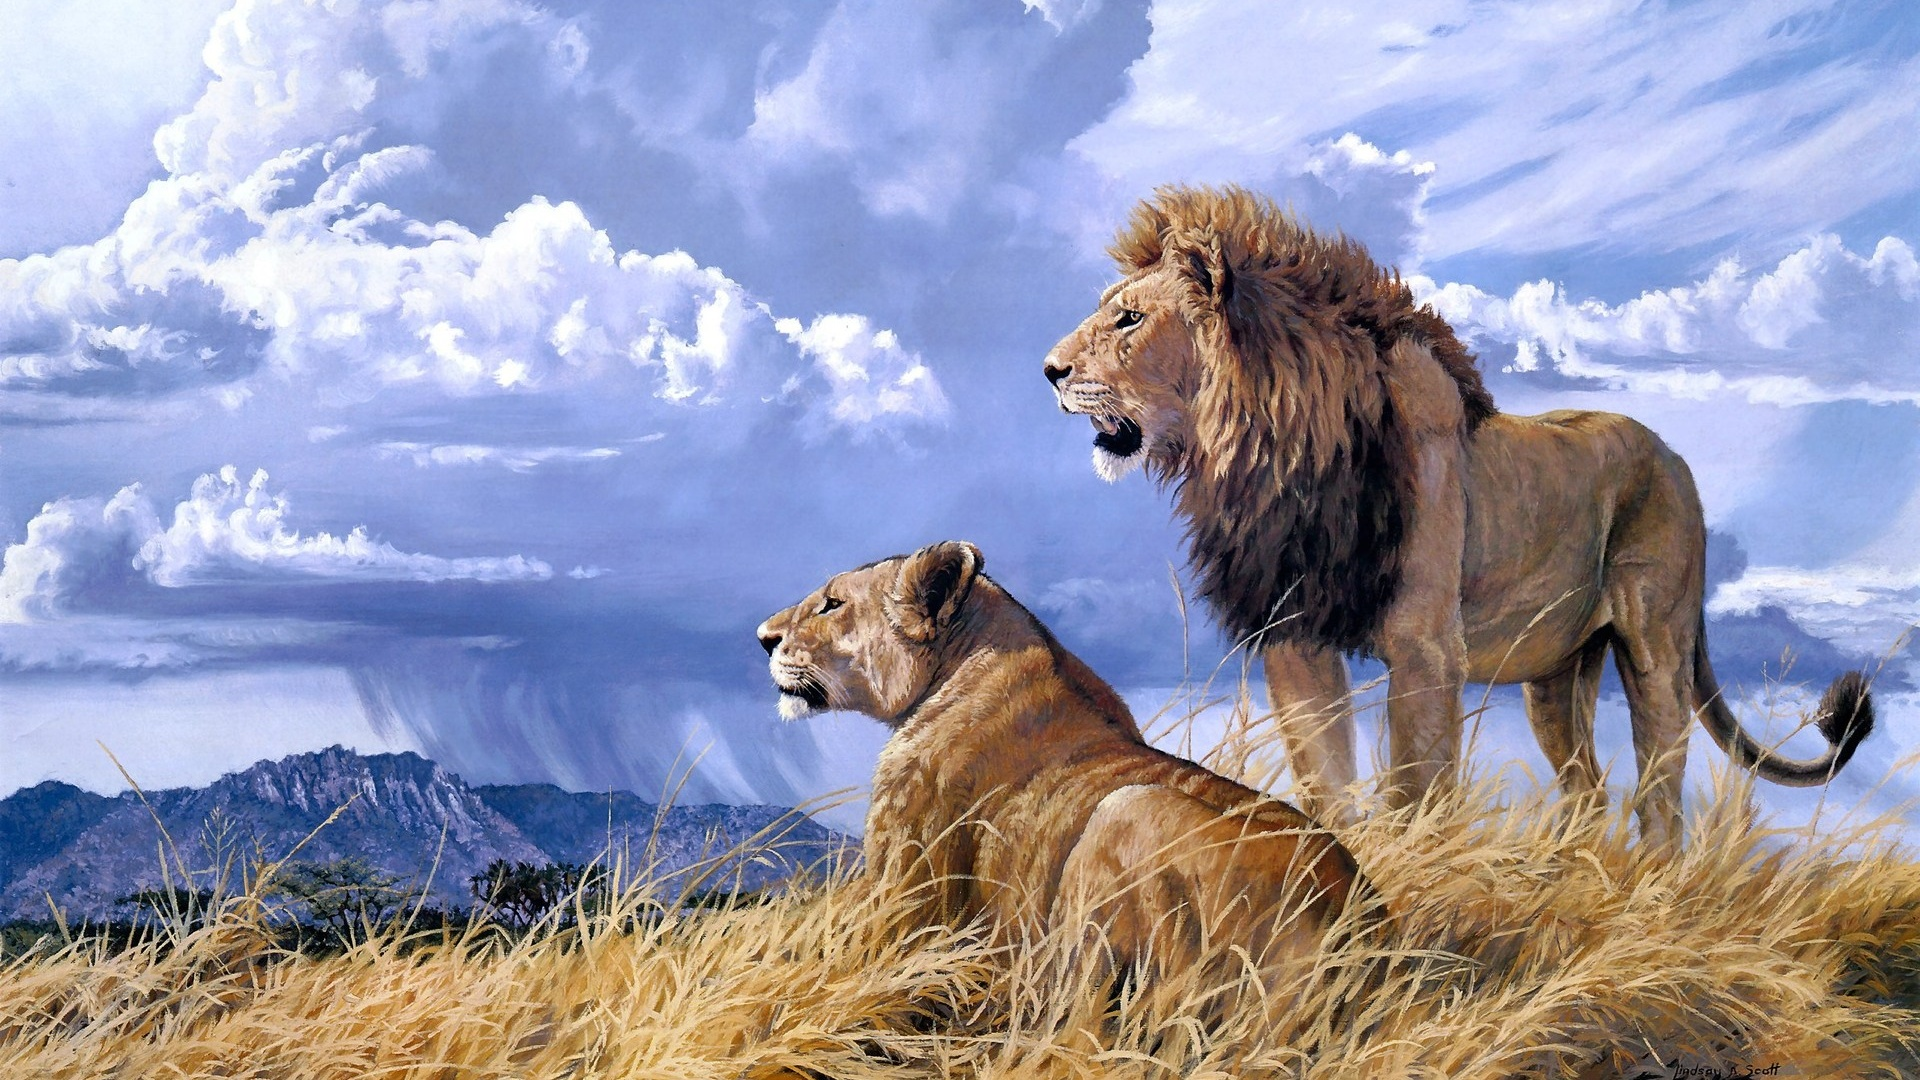 Lions wallpaper for desktop